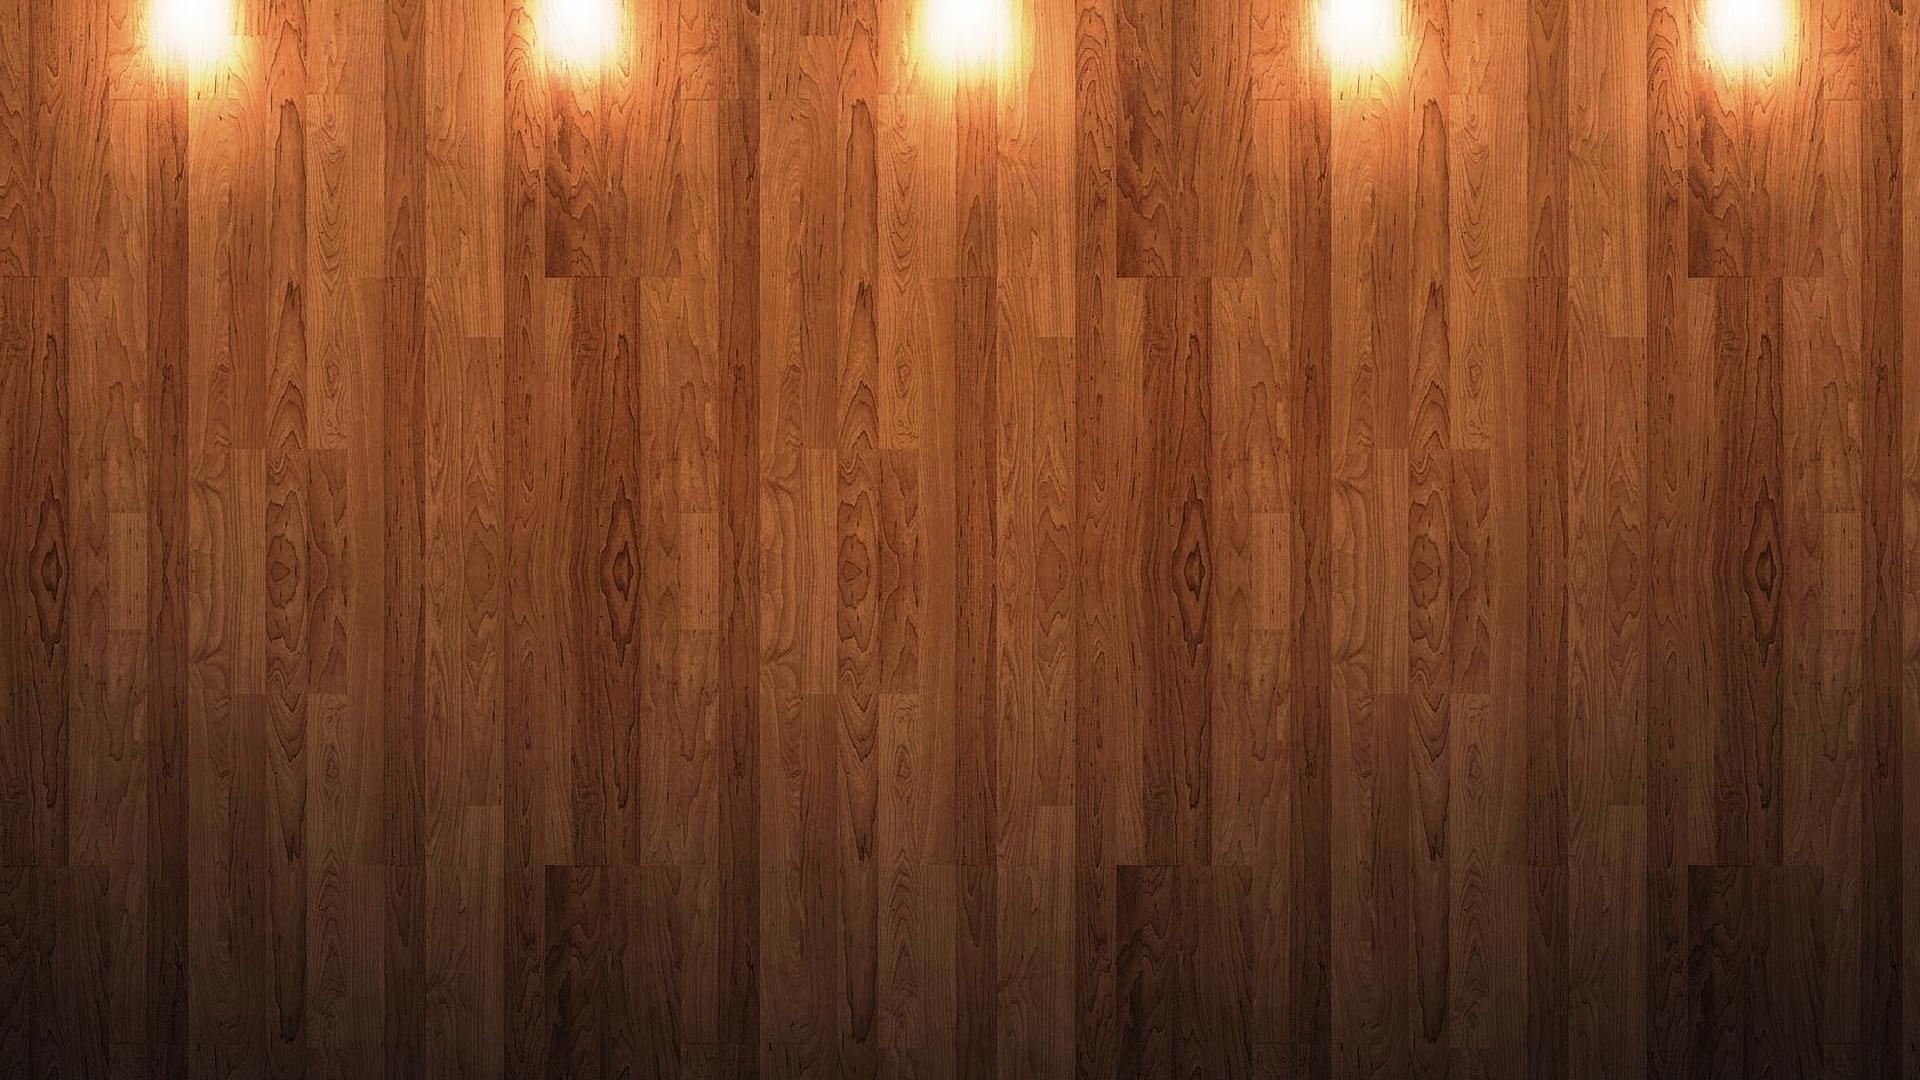 light wood wallpapers hd | pixelstalk